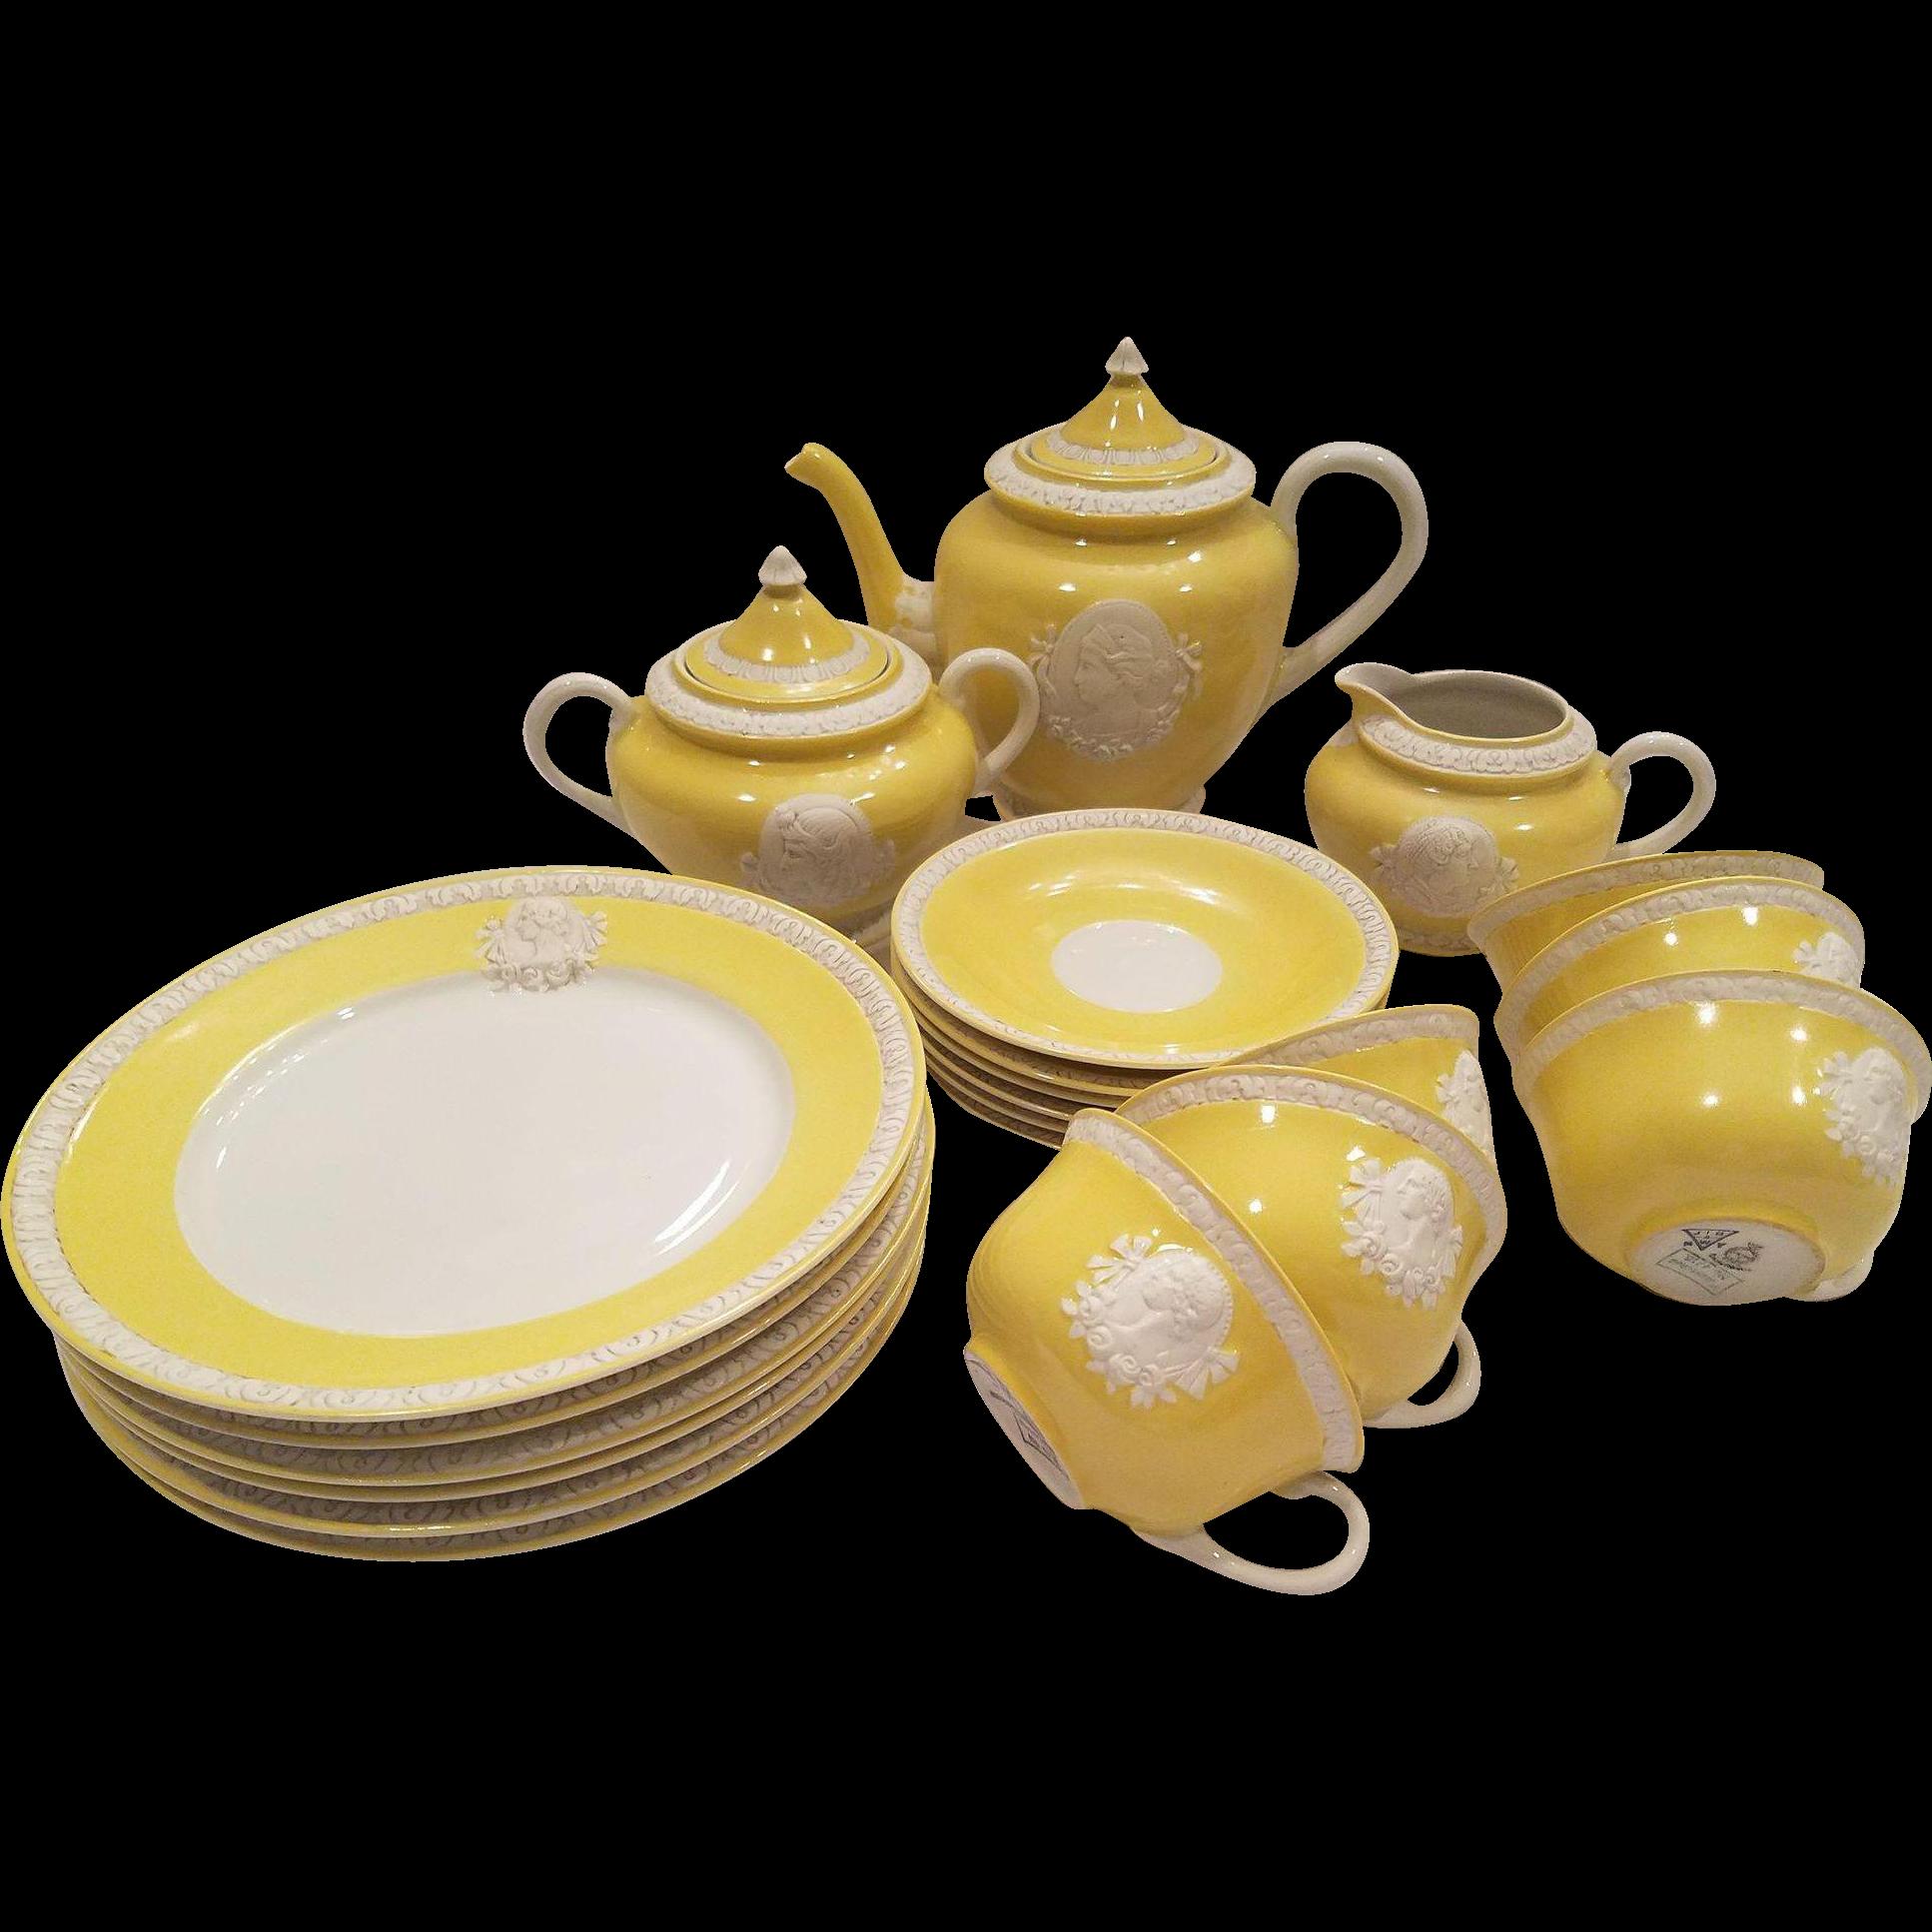 Yellow sugar bowls with lids - Dainty Musterschutz Czechoslovakia Union Tea Service Pastel Yellow Vintage Cameo Service For 6 Trios Tea Cups Saucers Plates Tea Pot Creamer Sugar Bowl